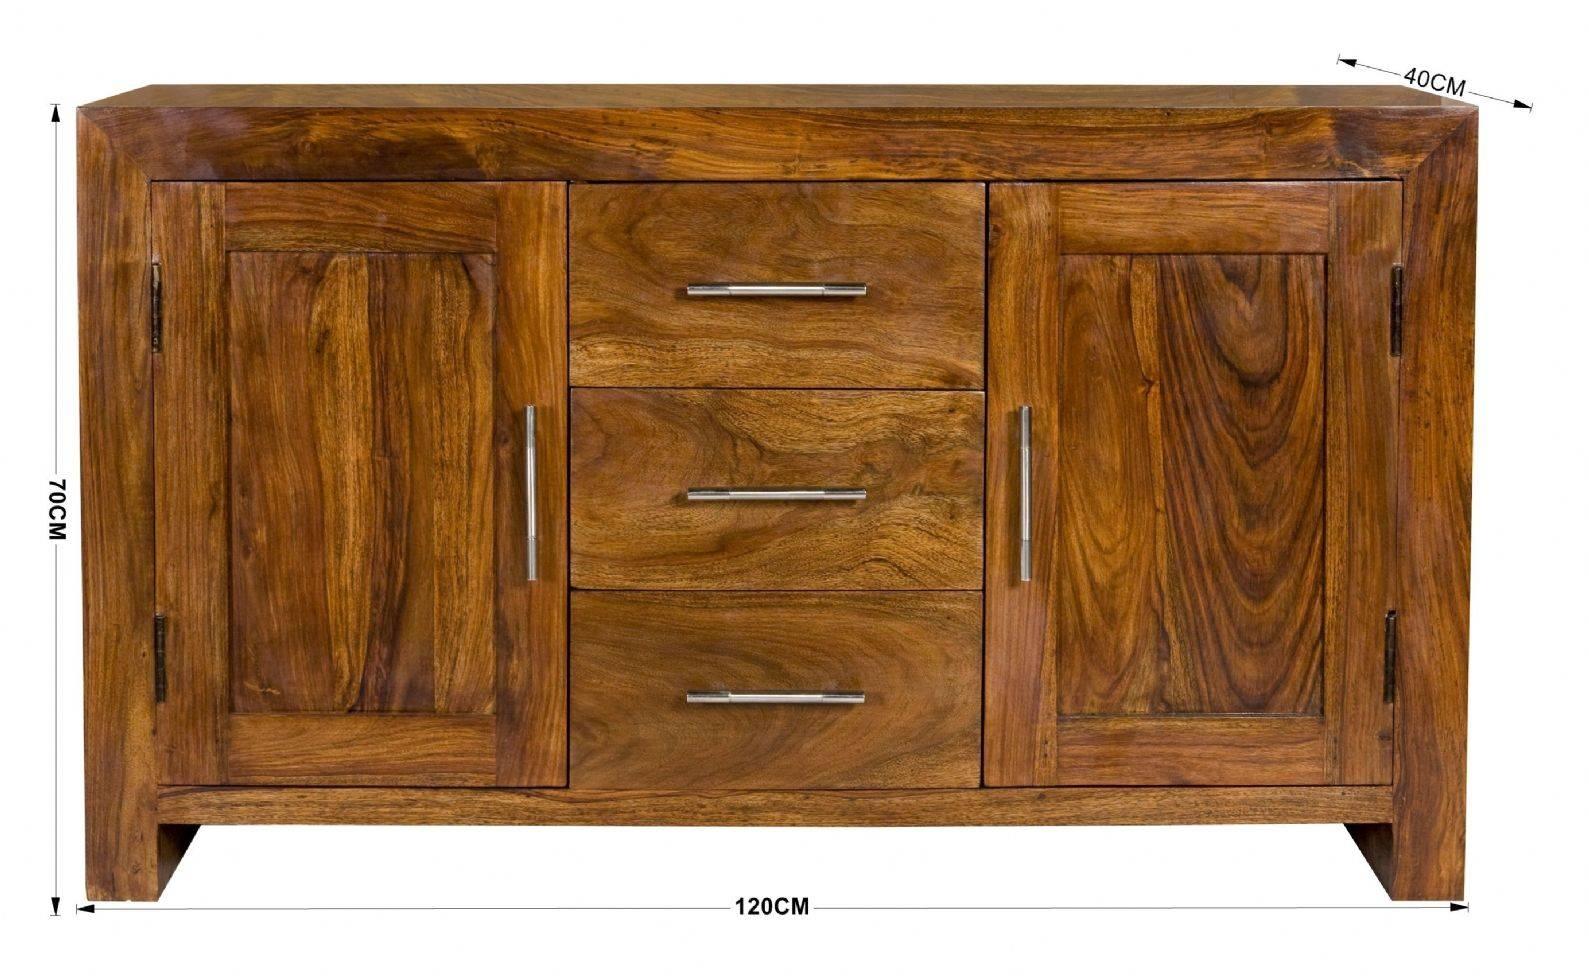 Petite Chunky 100% Solid Sheesham Wood Sideboard Cabinet Regarding Sheesham Sideboards (View 12 of 20)